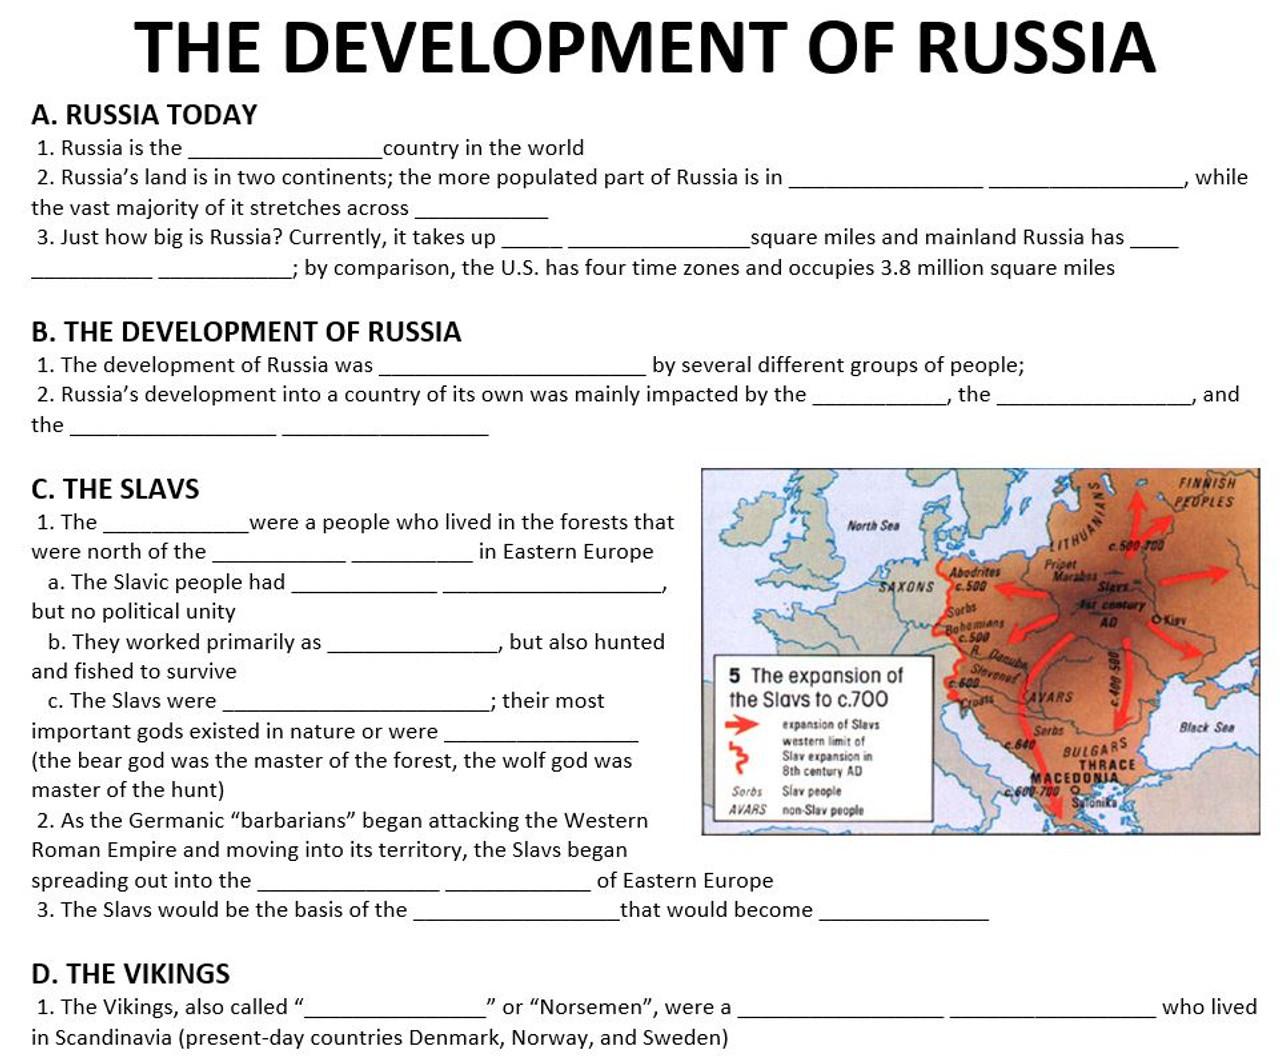 Development of Russia